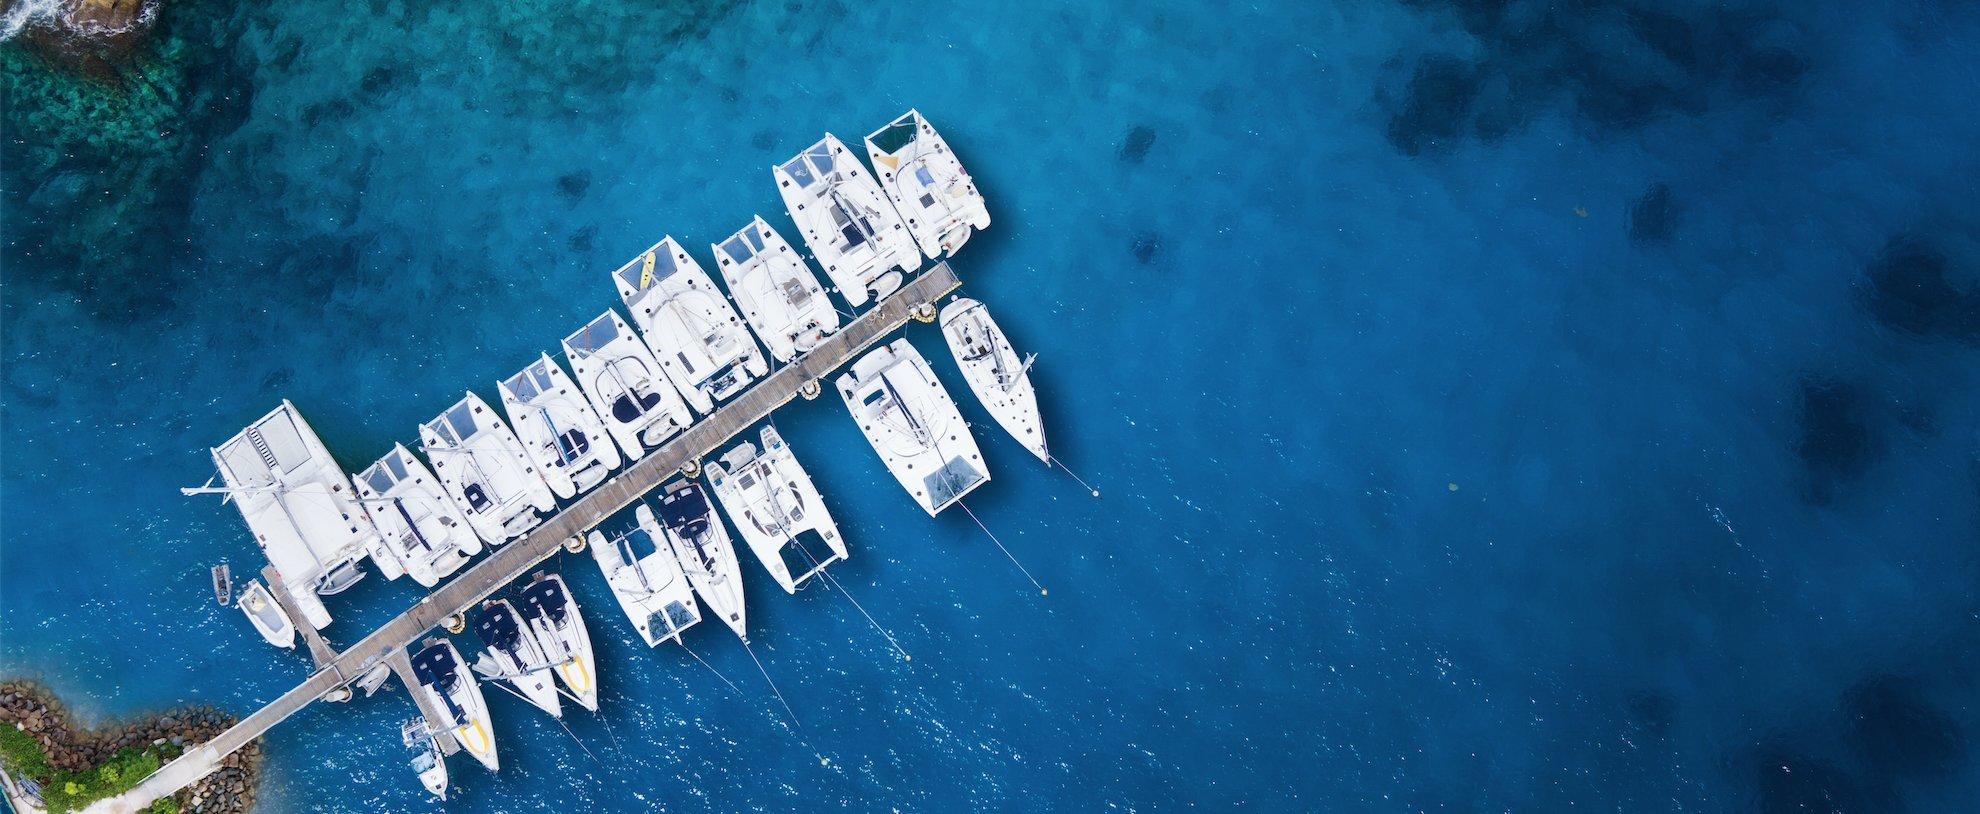 sicily-yacht-charter-sicily-yacht-rental-sicily-boat-charter-sicily-boat-rental-sicily-sailing-charter-marina